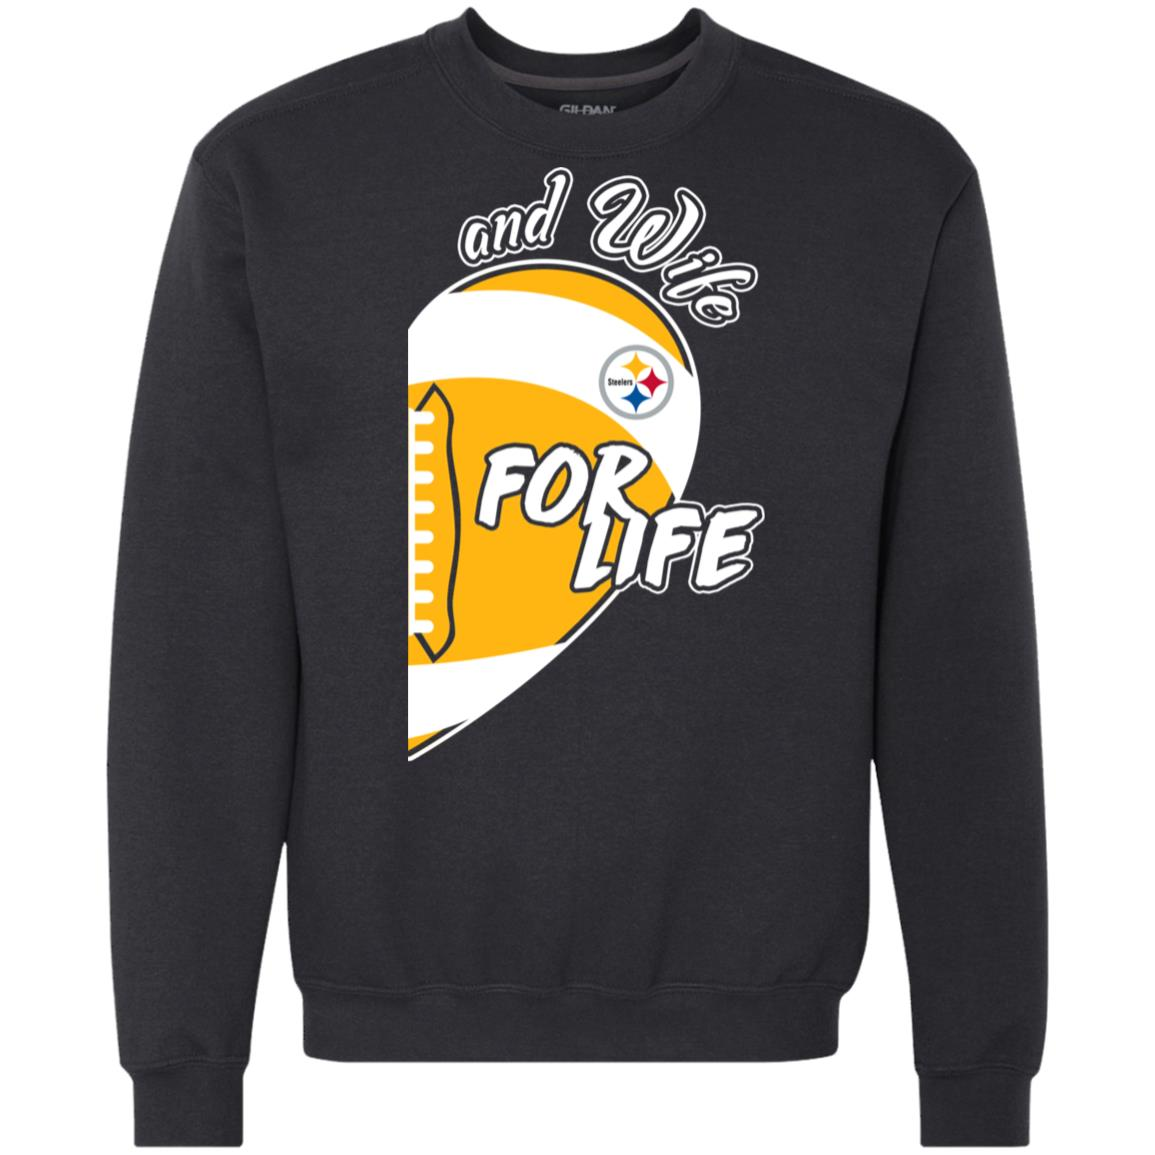 best service f04b3 ebc49 Steerlers and Wife For Life Pittsburgh Steelers T shirts Hoodies,  Sweatshirts